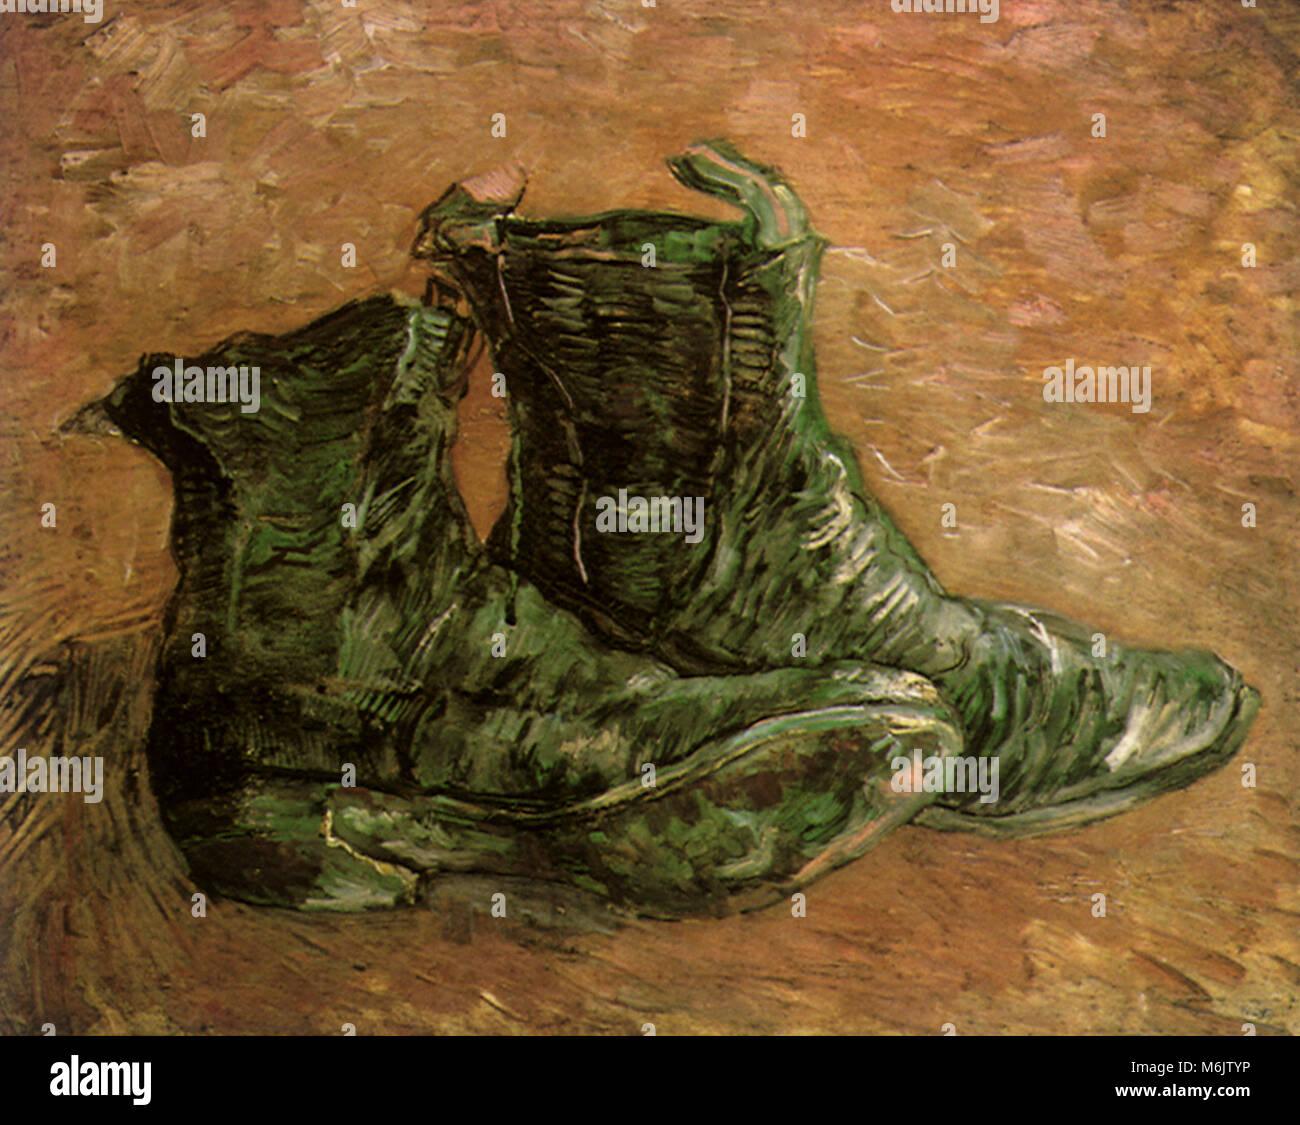 Un paio di scarpe, Van Gogh, Vincent Willem, 1887 Foto